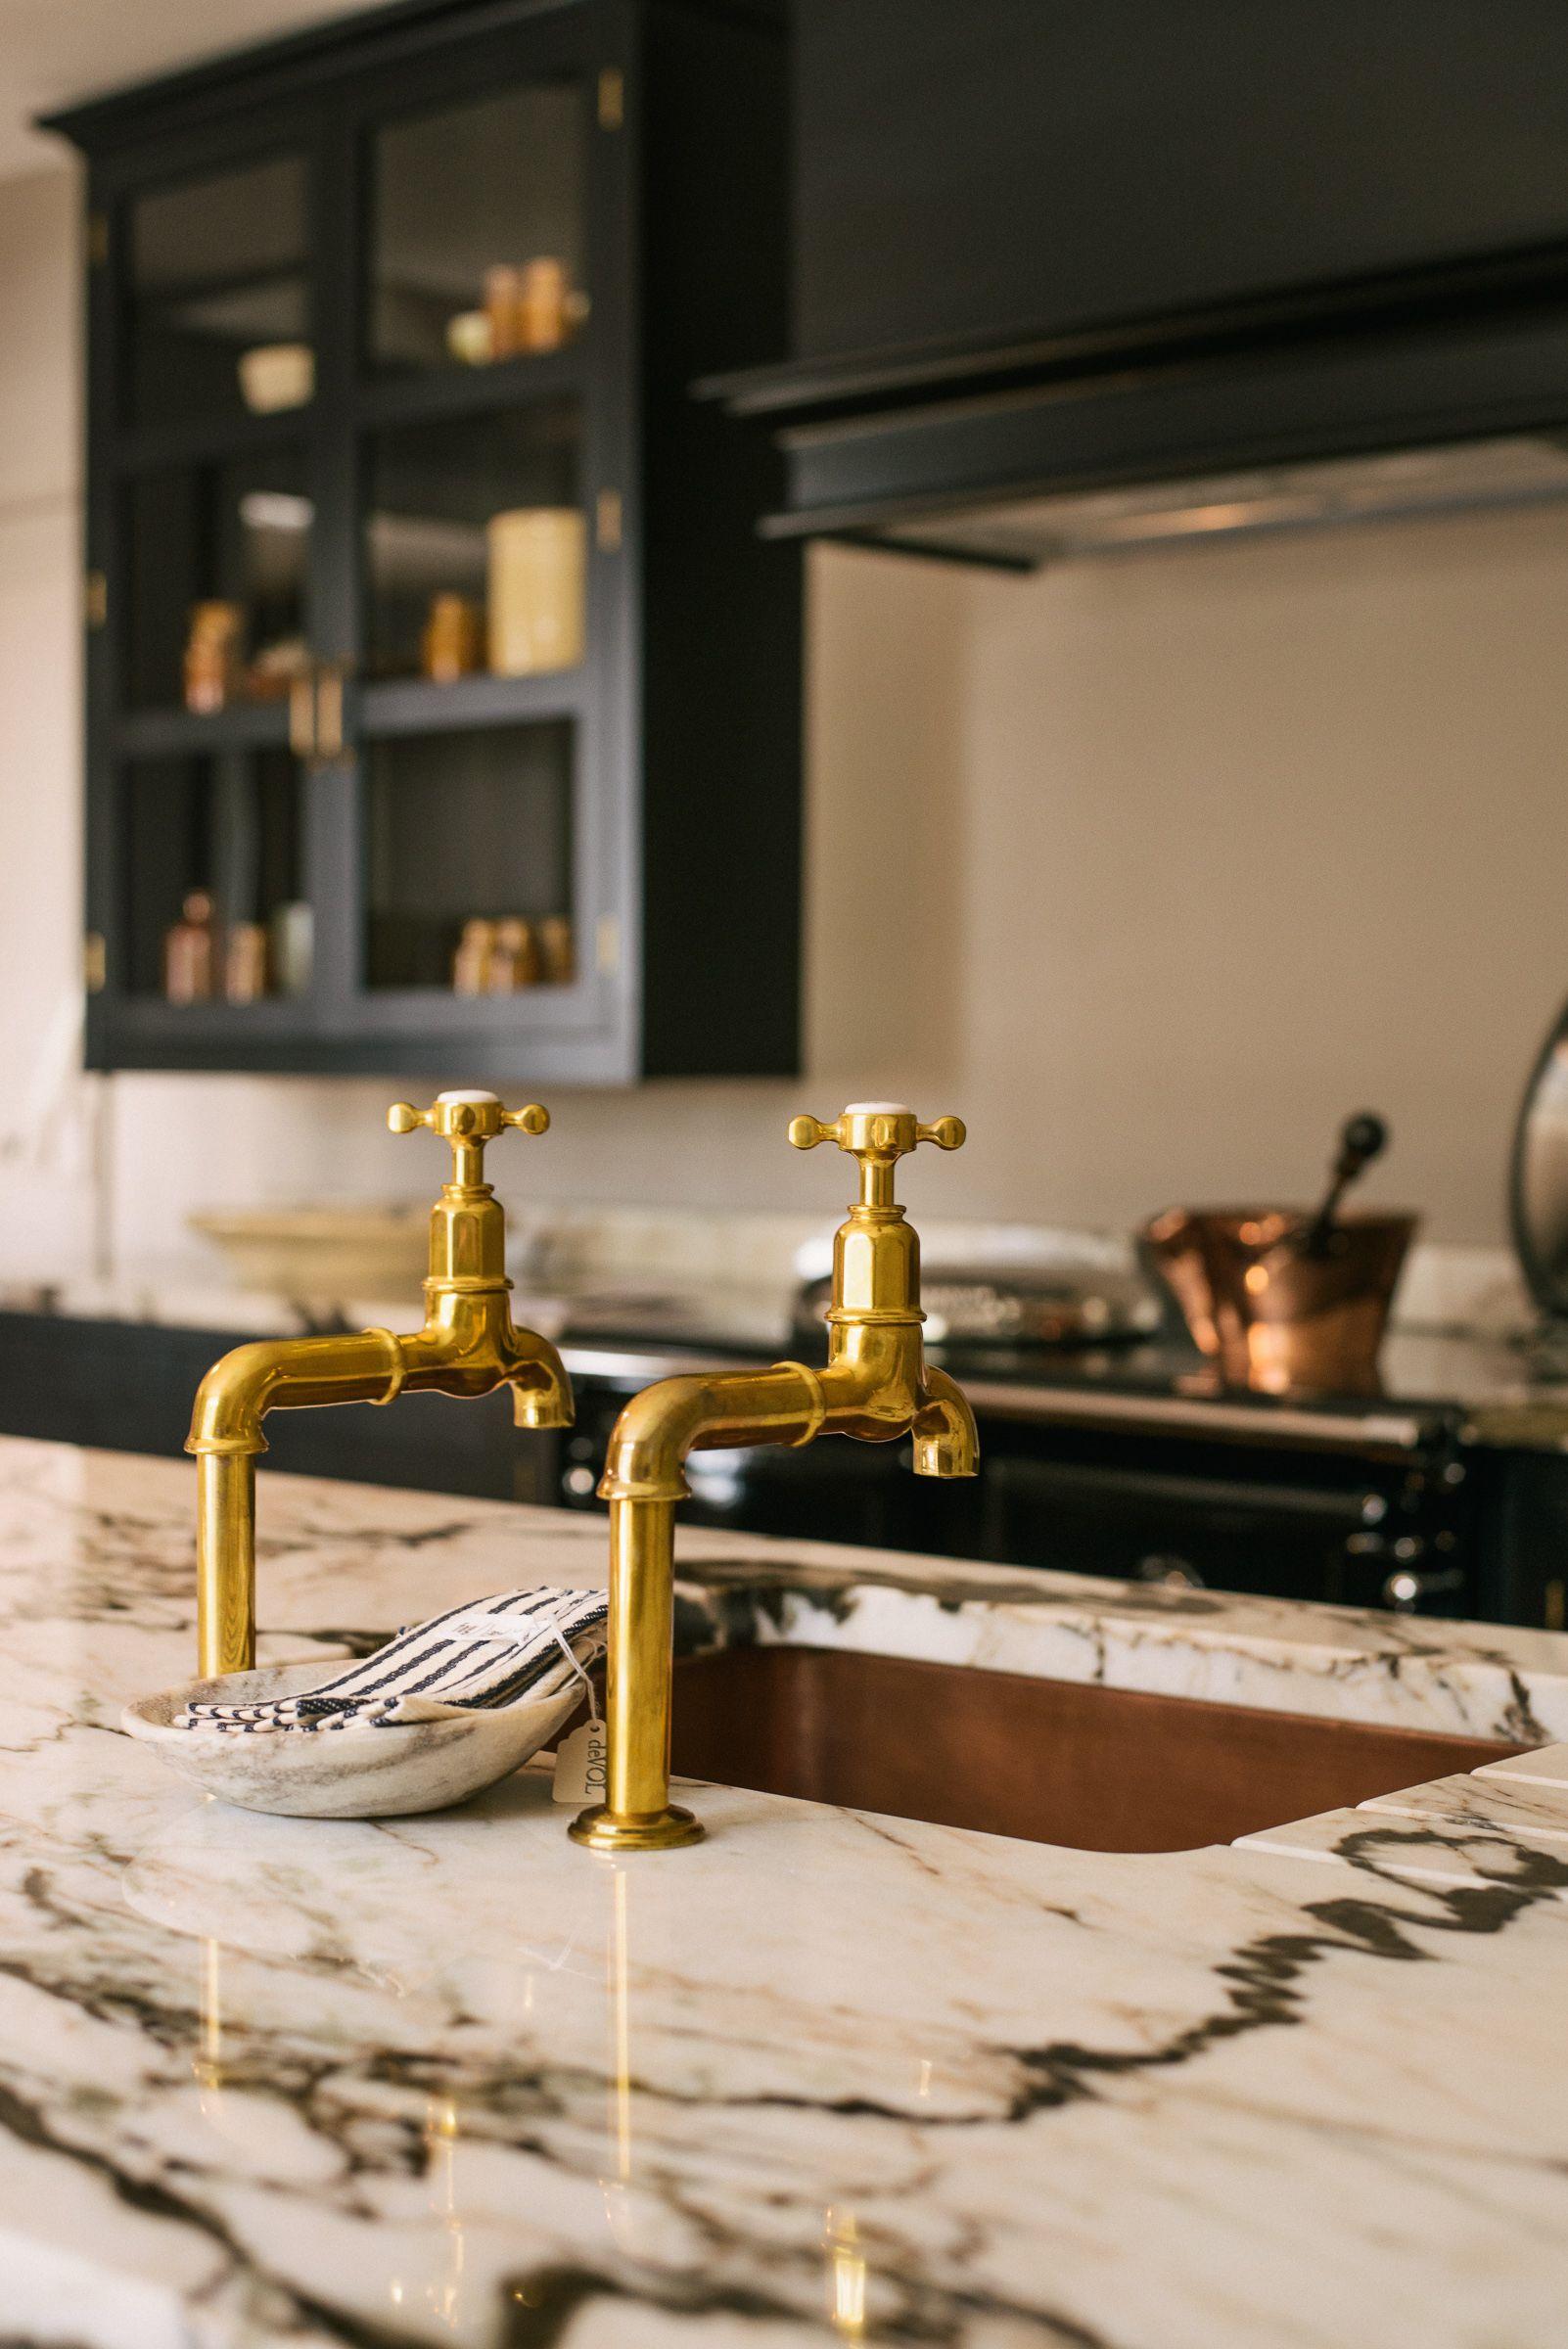 Devol Aged Brass Taps San Simone Quartzite Worktops And A Beautiful Copper Sink Look So Cool In